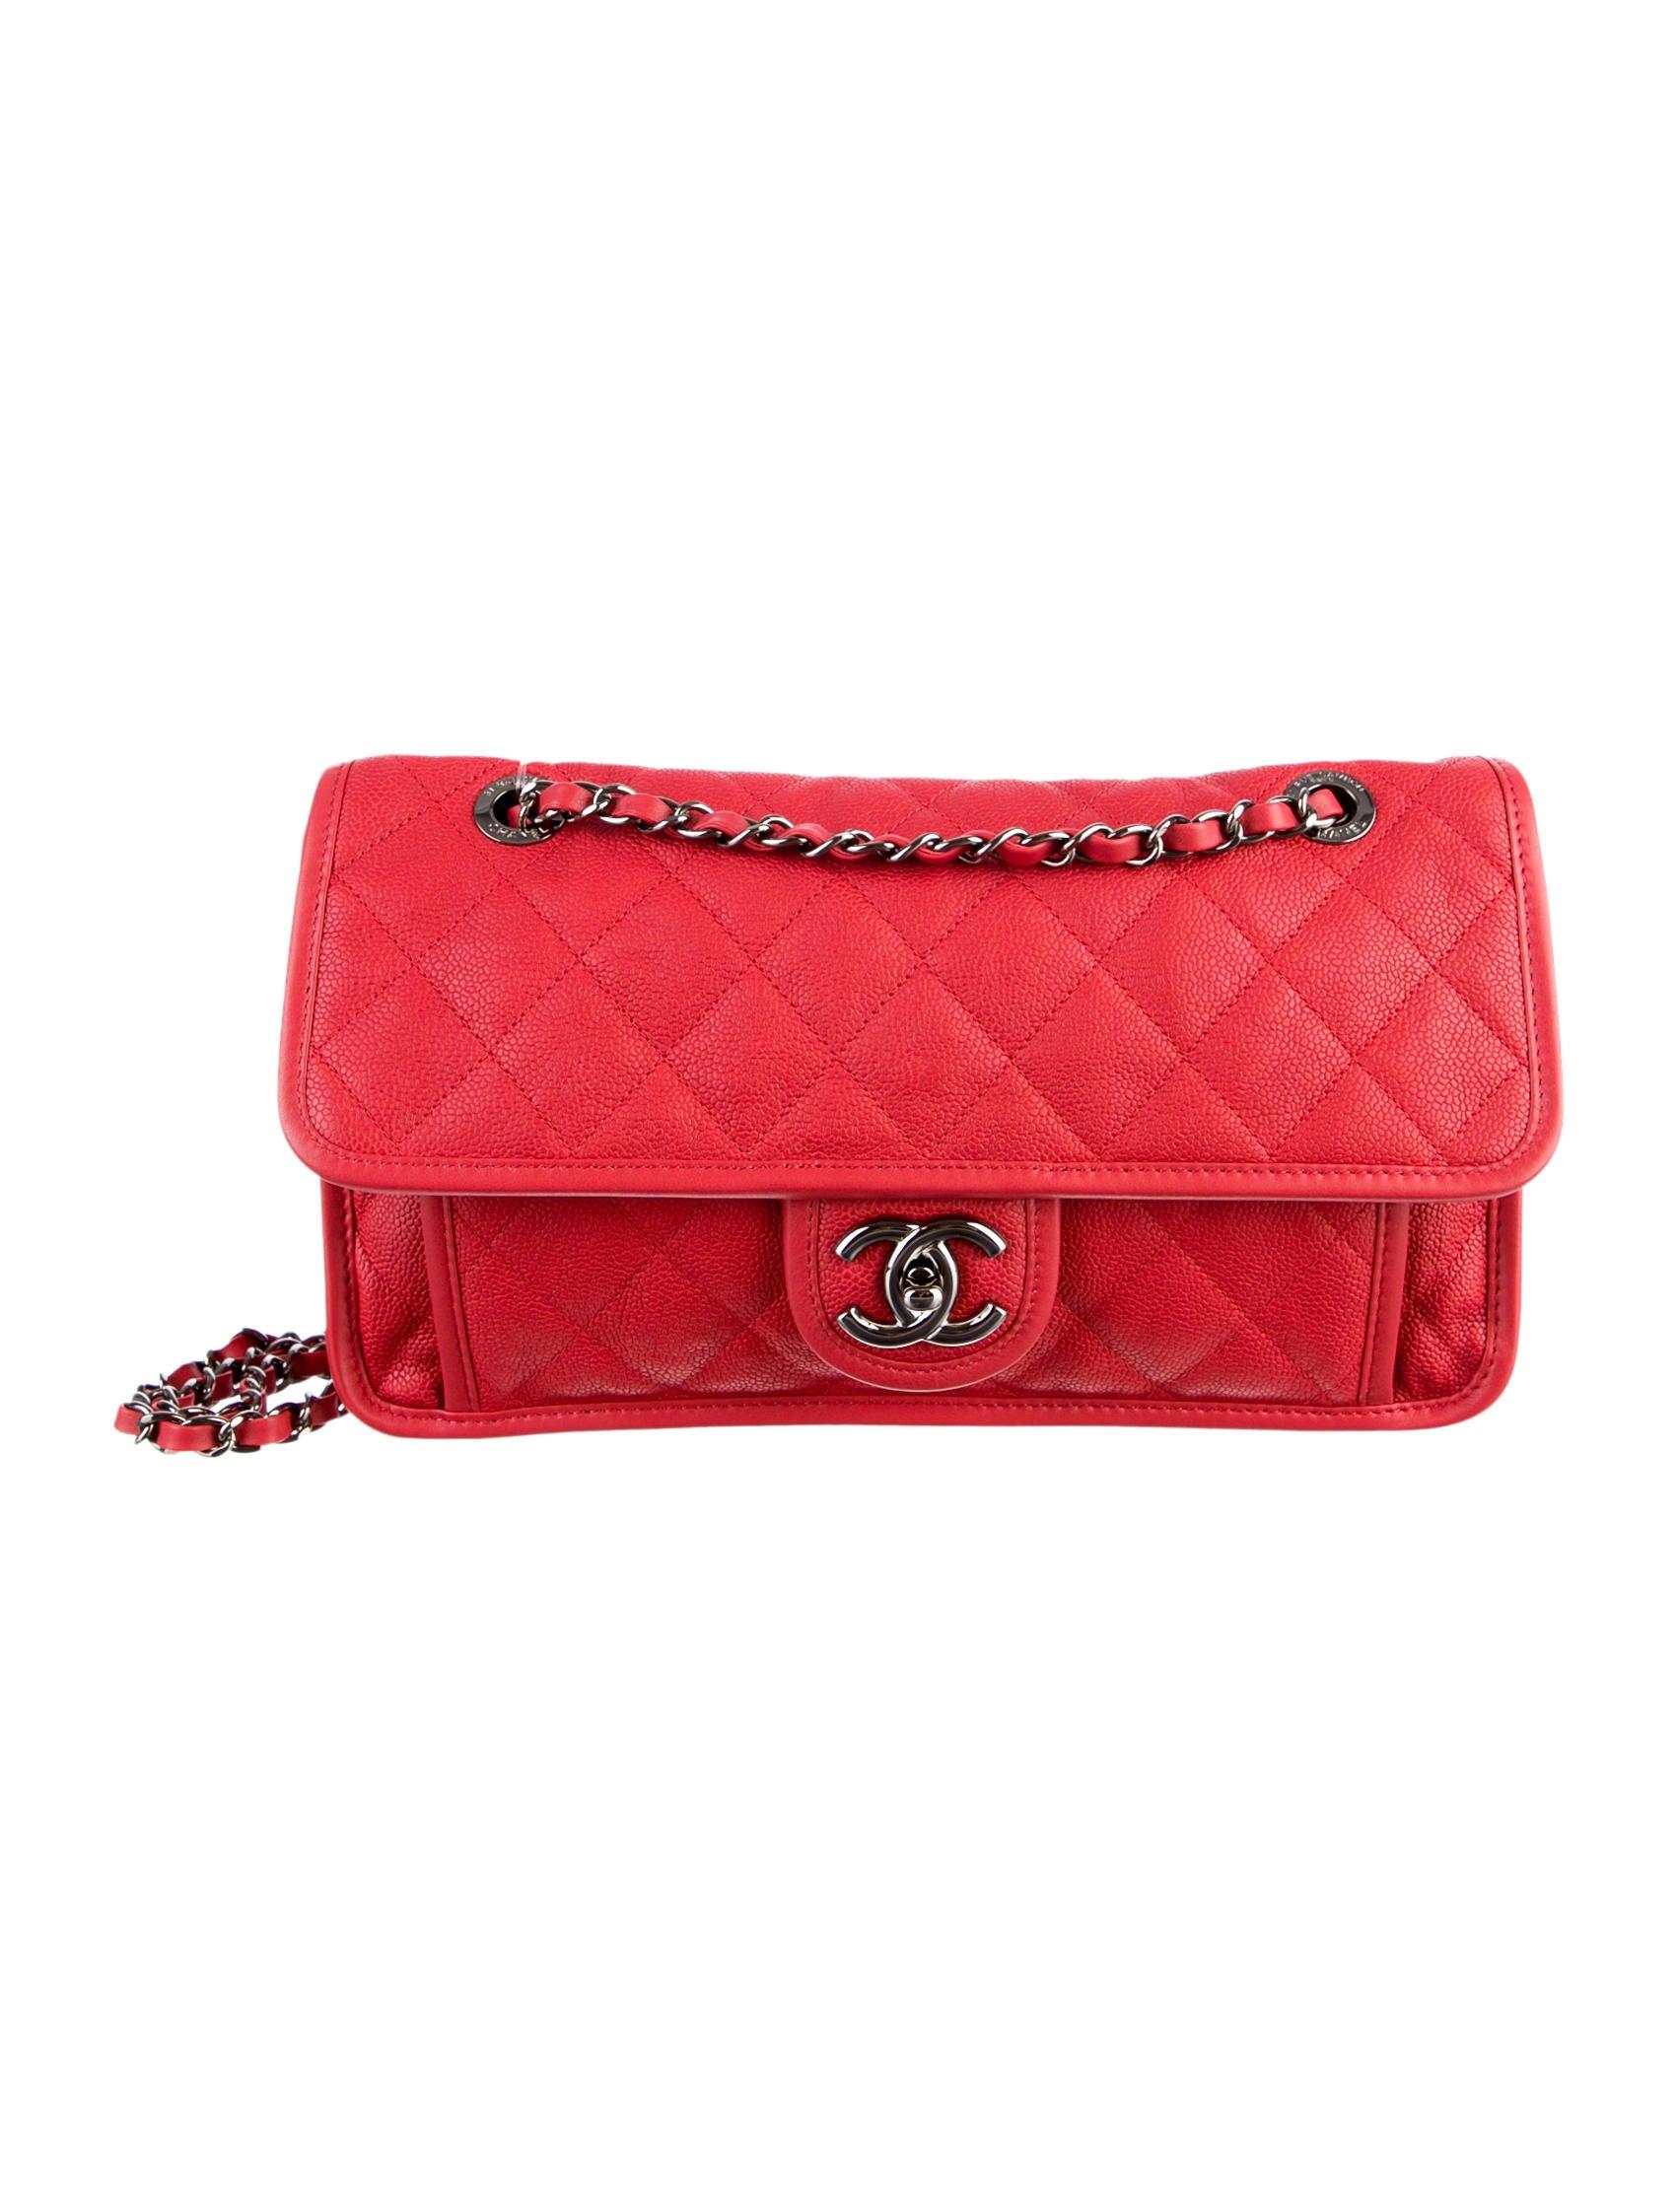 4804d667d1f324 Chanel French Riviera Medium Flap Bag w/ Tags - Handbags - CHA33108 ...